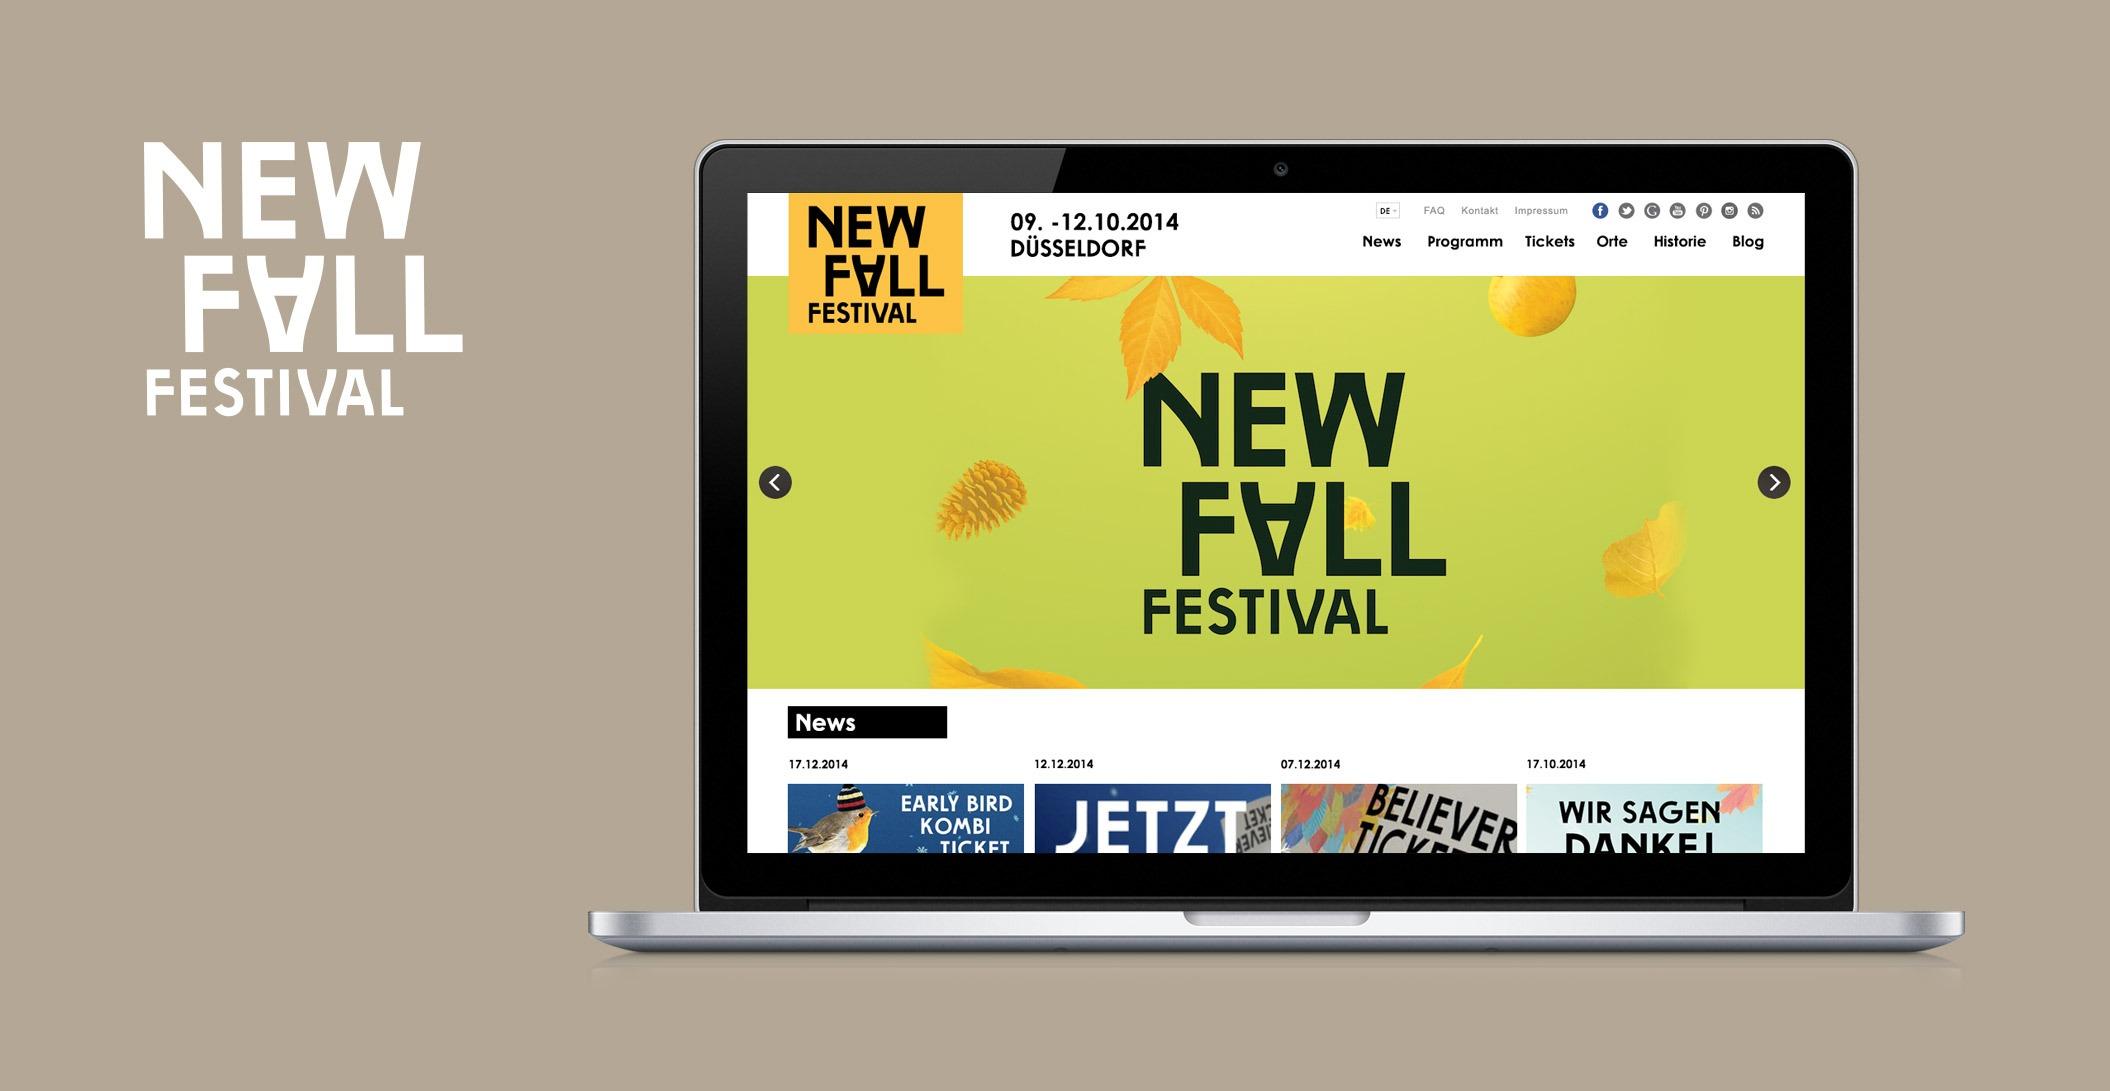 Startseite – New Fall Festival